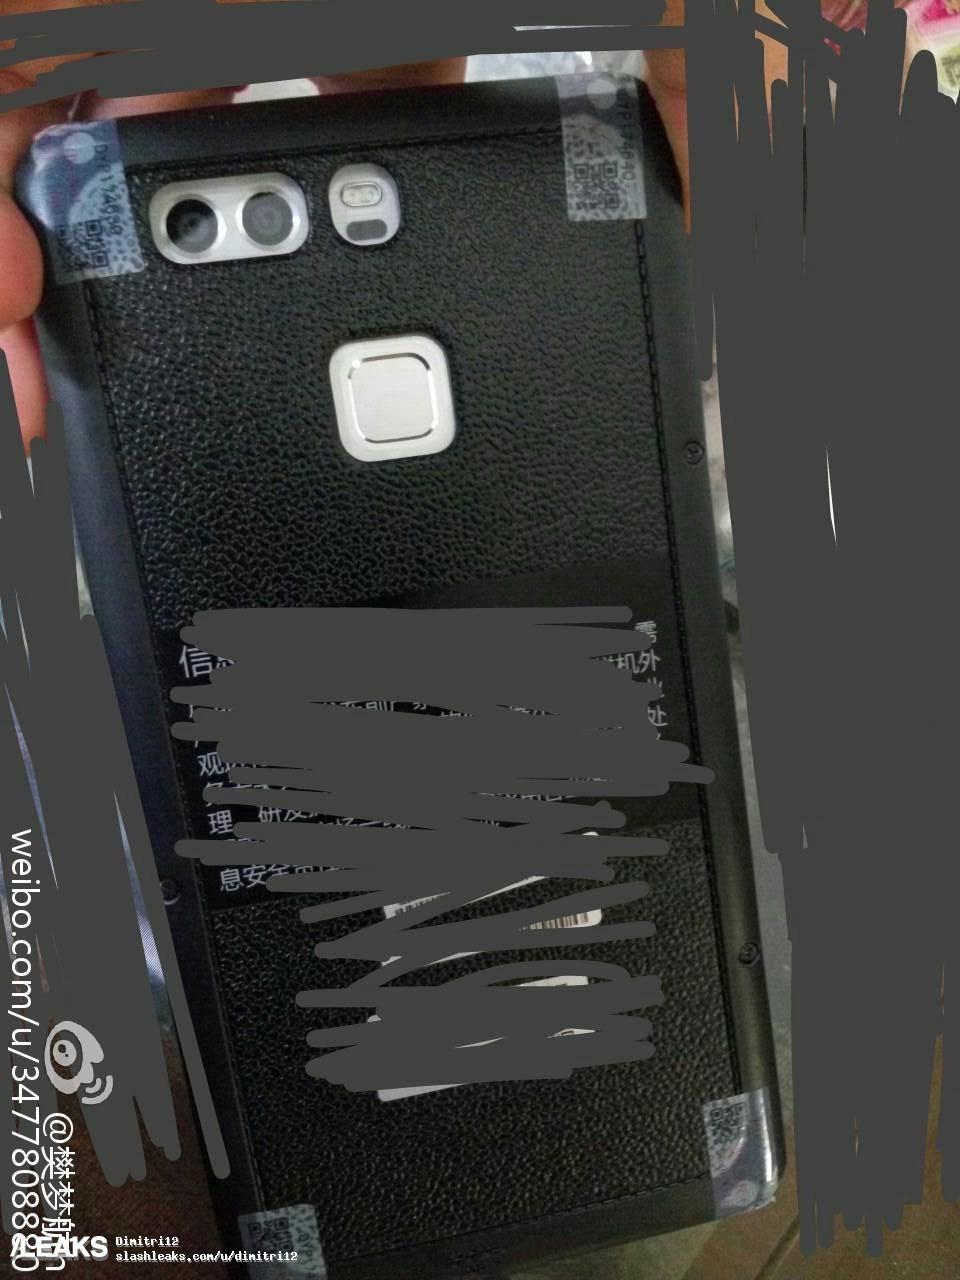 img Huawei P9 prototype confirms dual-camera setup, rear fingerprint sensor